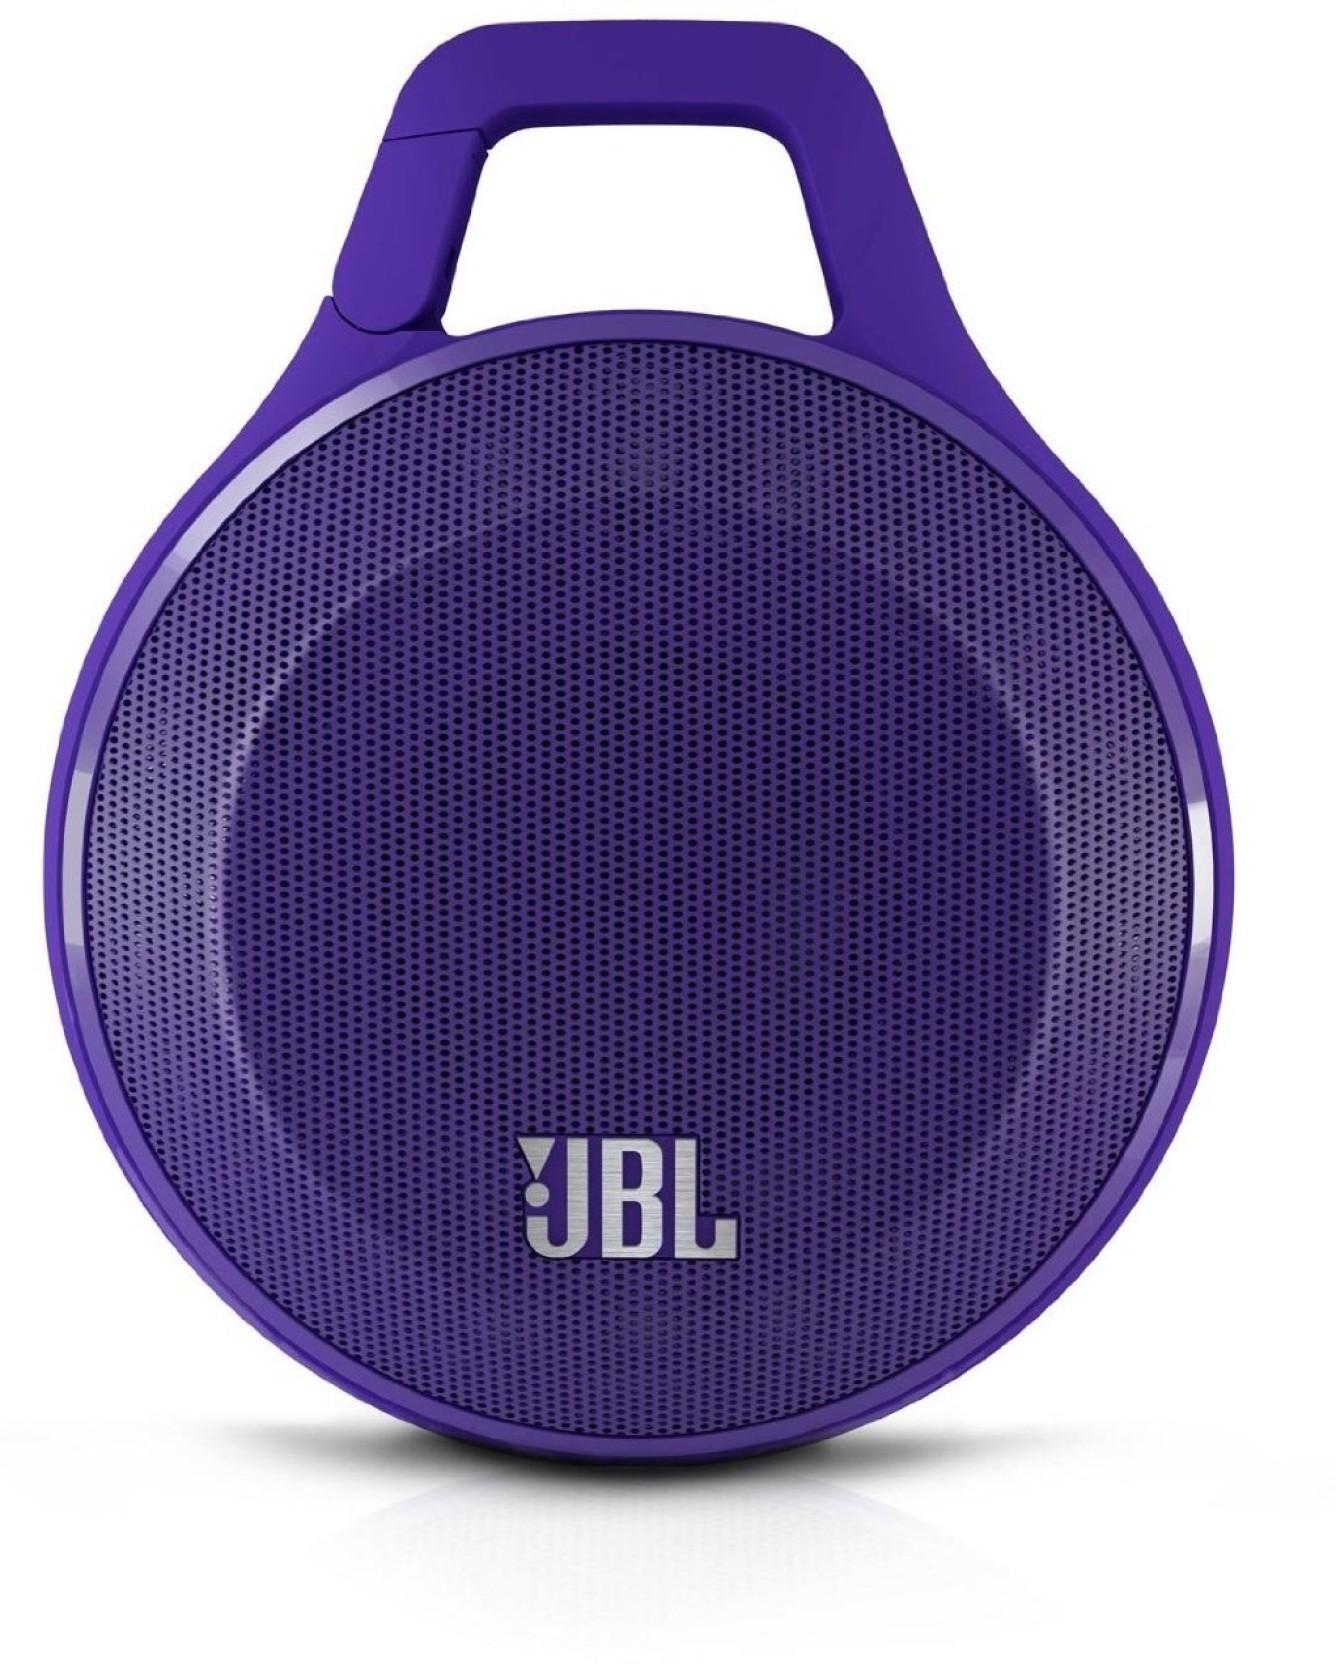 Jbl Bluetooth Speaker Flipkart Bluetooth 4 0 Ble Module Datasheet Bluetooth Thermal Printer India Bluetooth For Music In Car: Buy JBL Clip Portable Bluetooth Mobile/Tablet Speaker